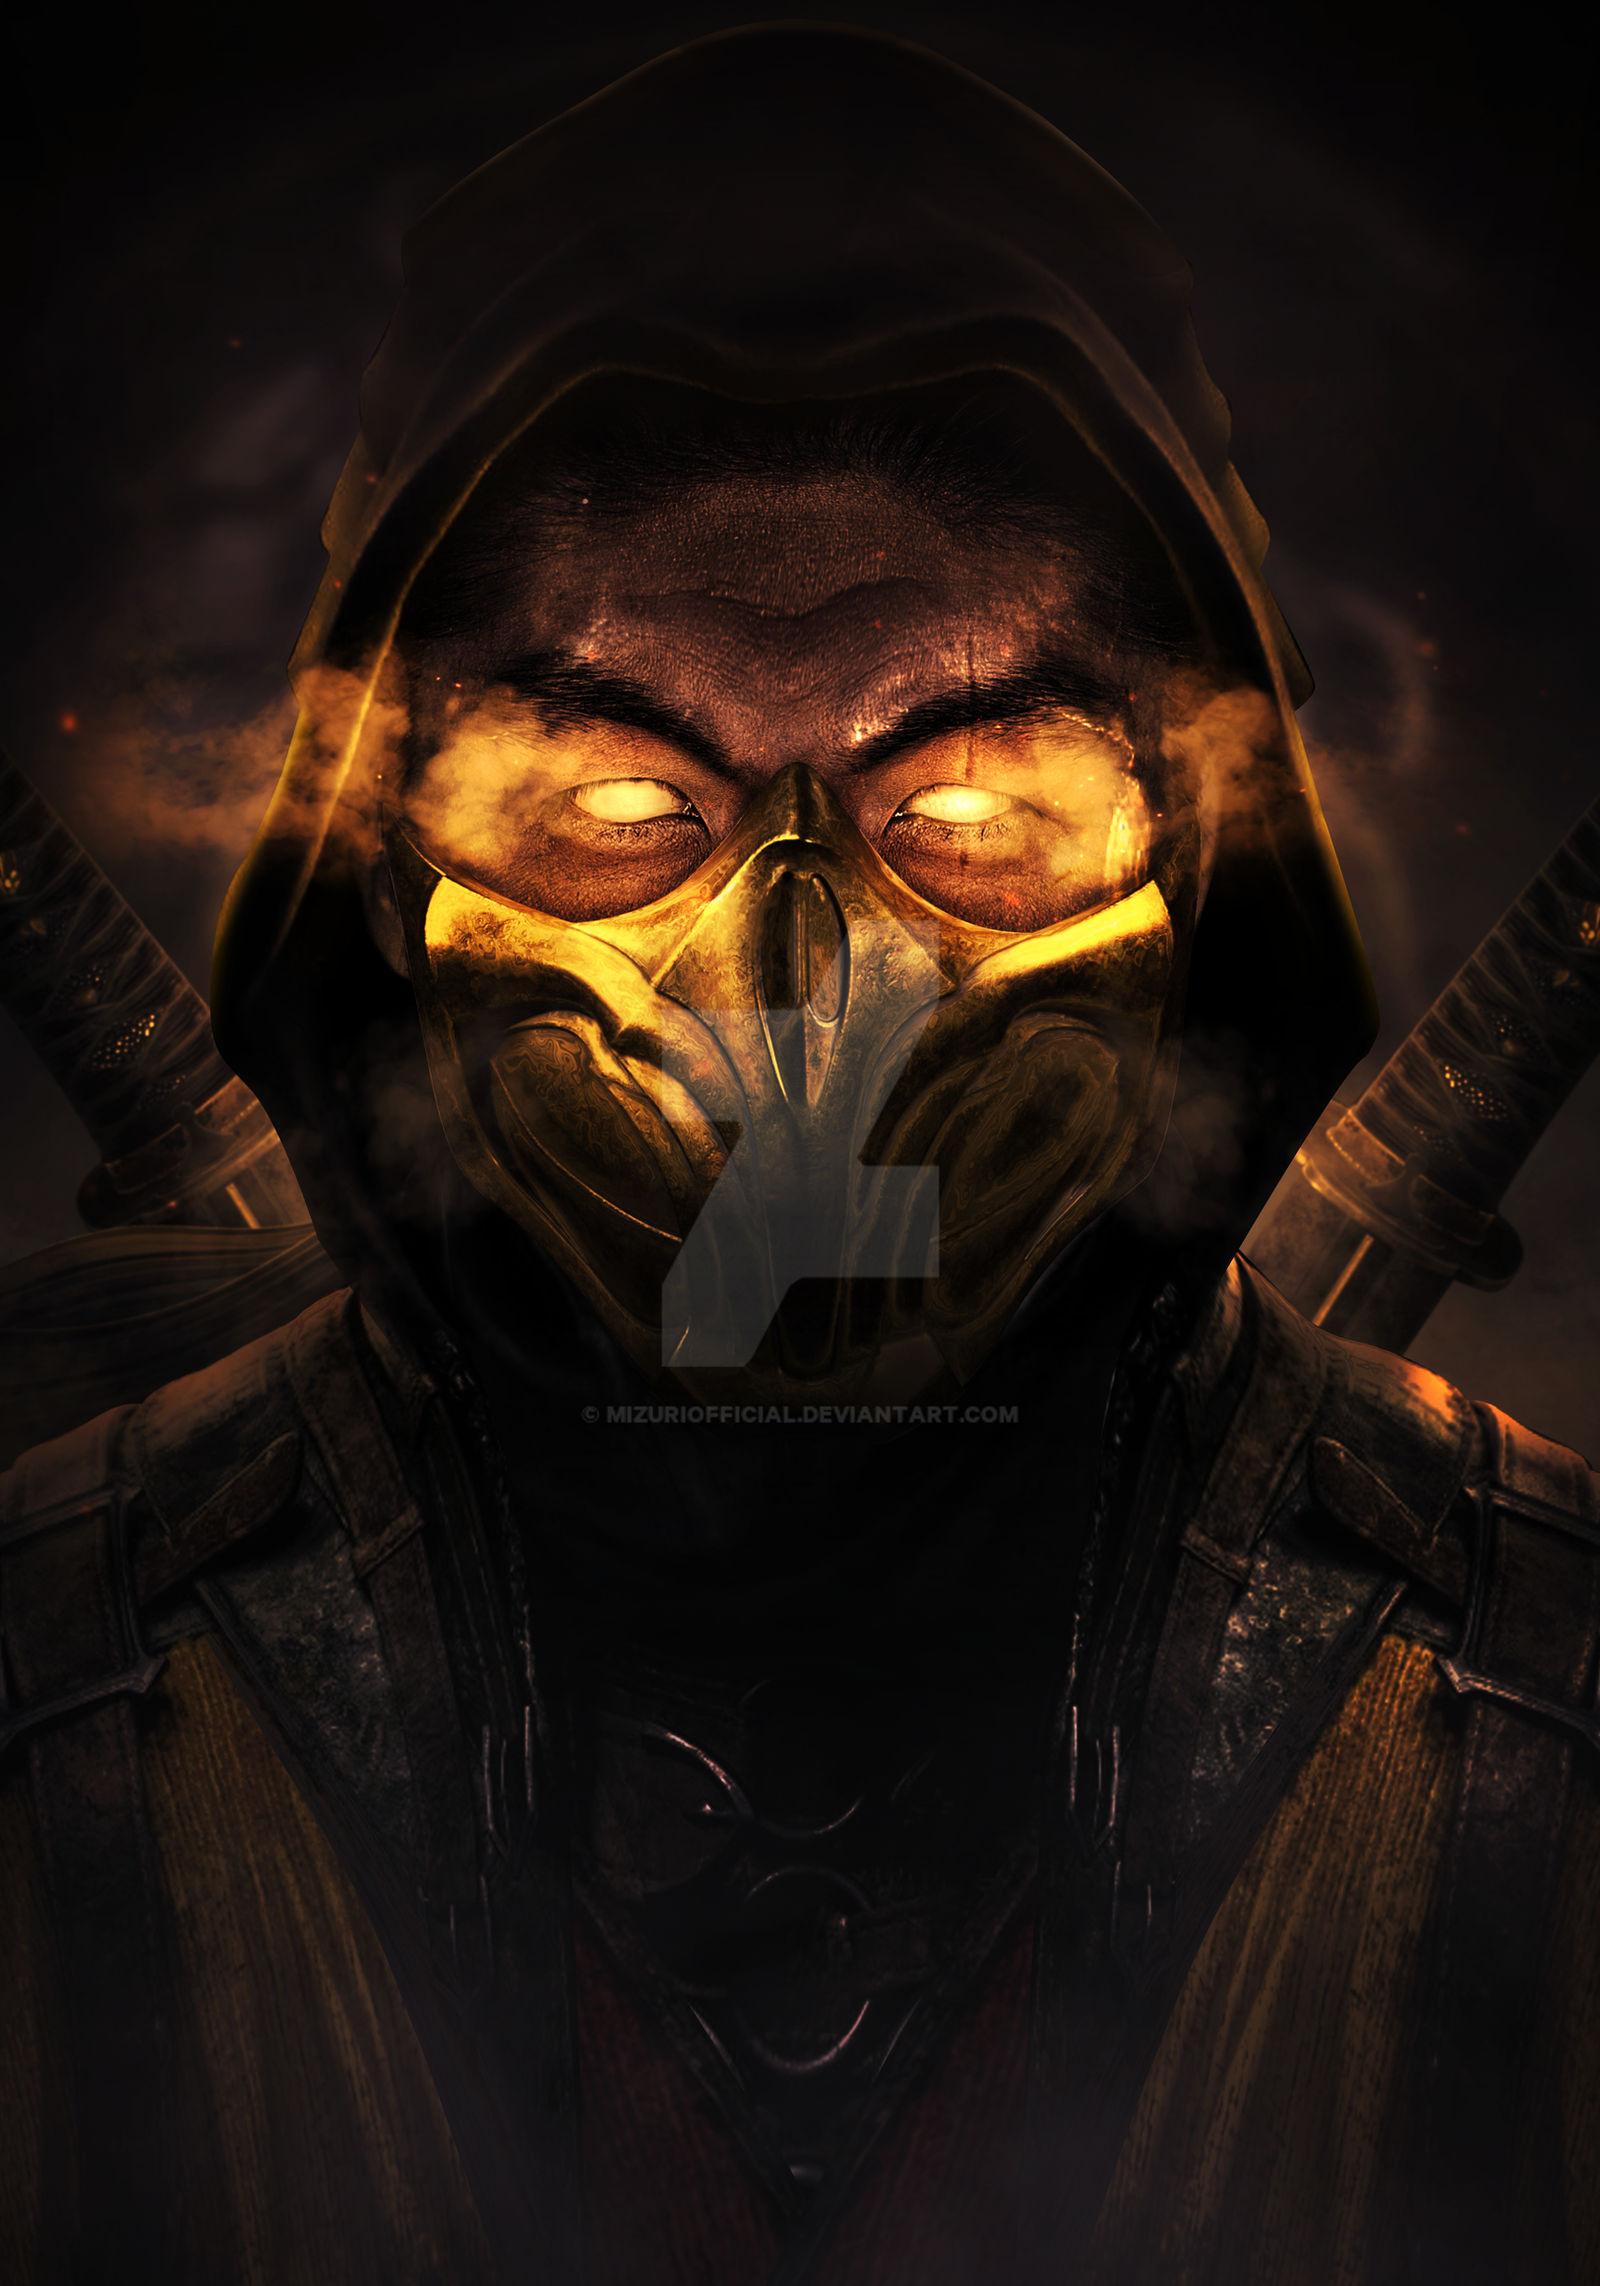 Mortal Kombat 11 Scorpion Hooded Brian Tee By Mizuriofficial